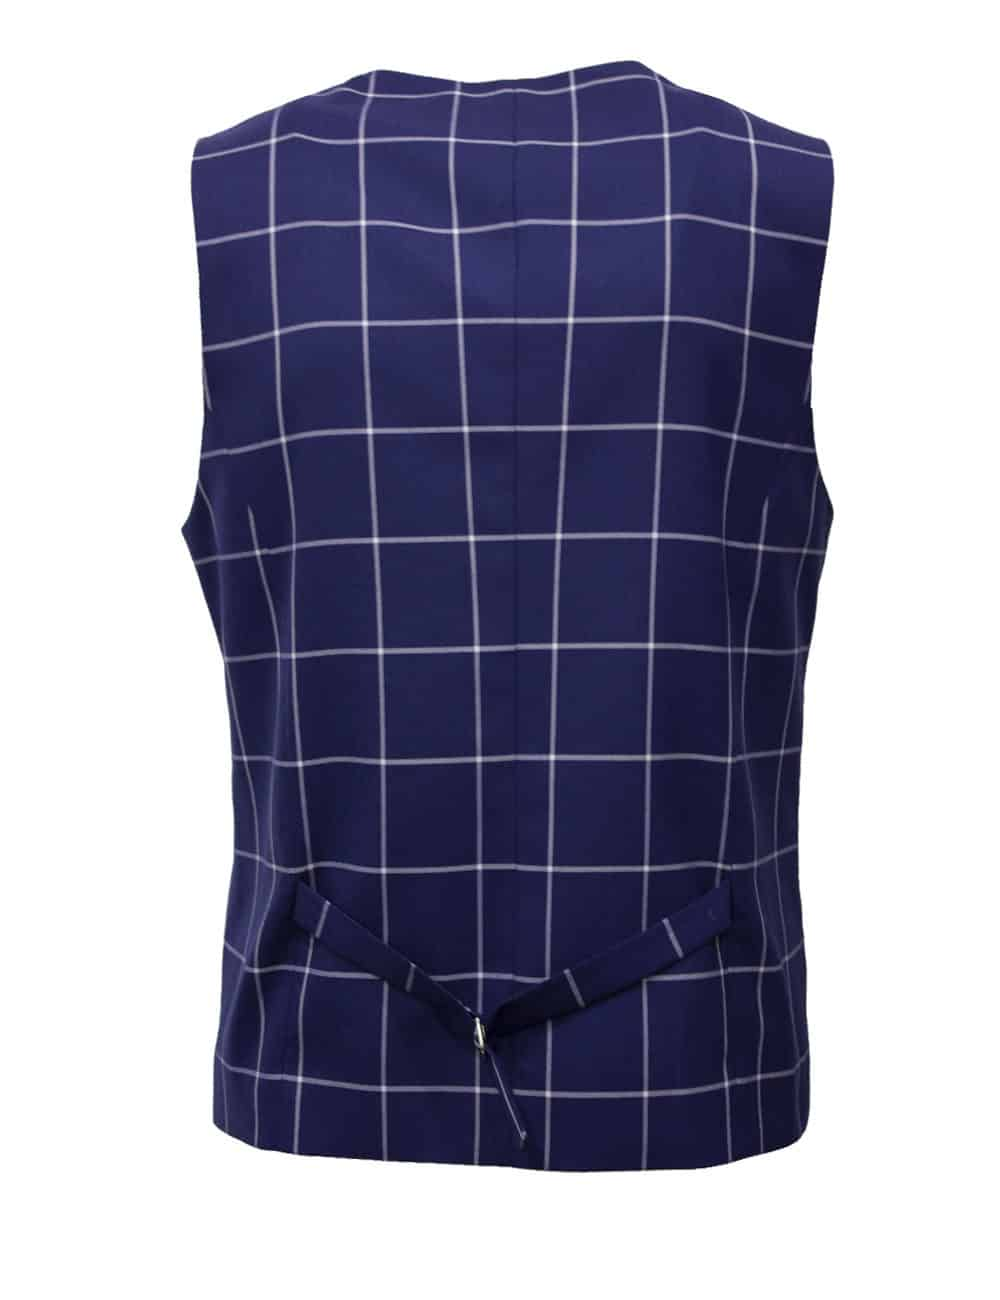 Tailored Fit Blue Checks Single Breasted Vest V1V2.3